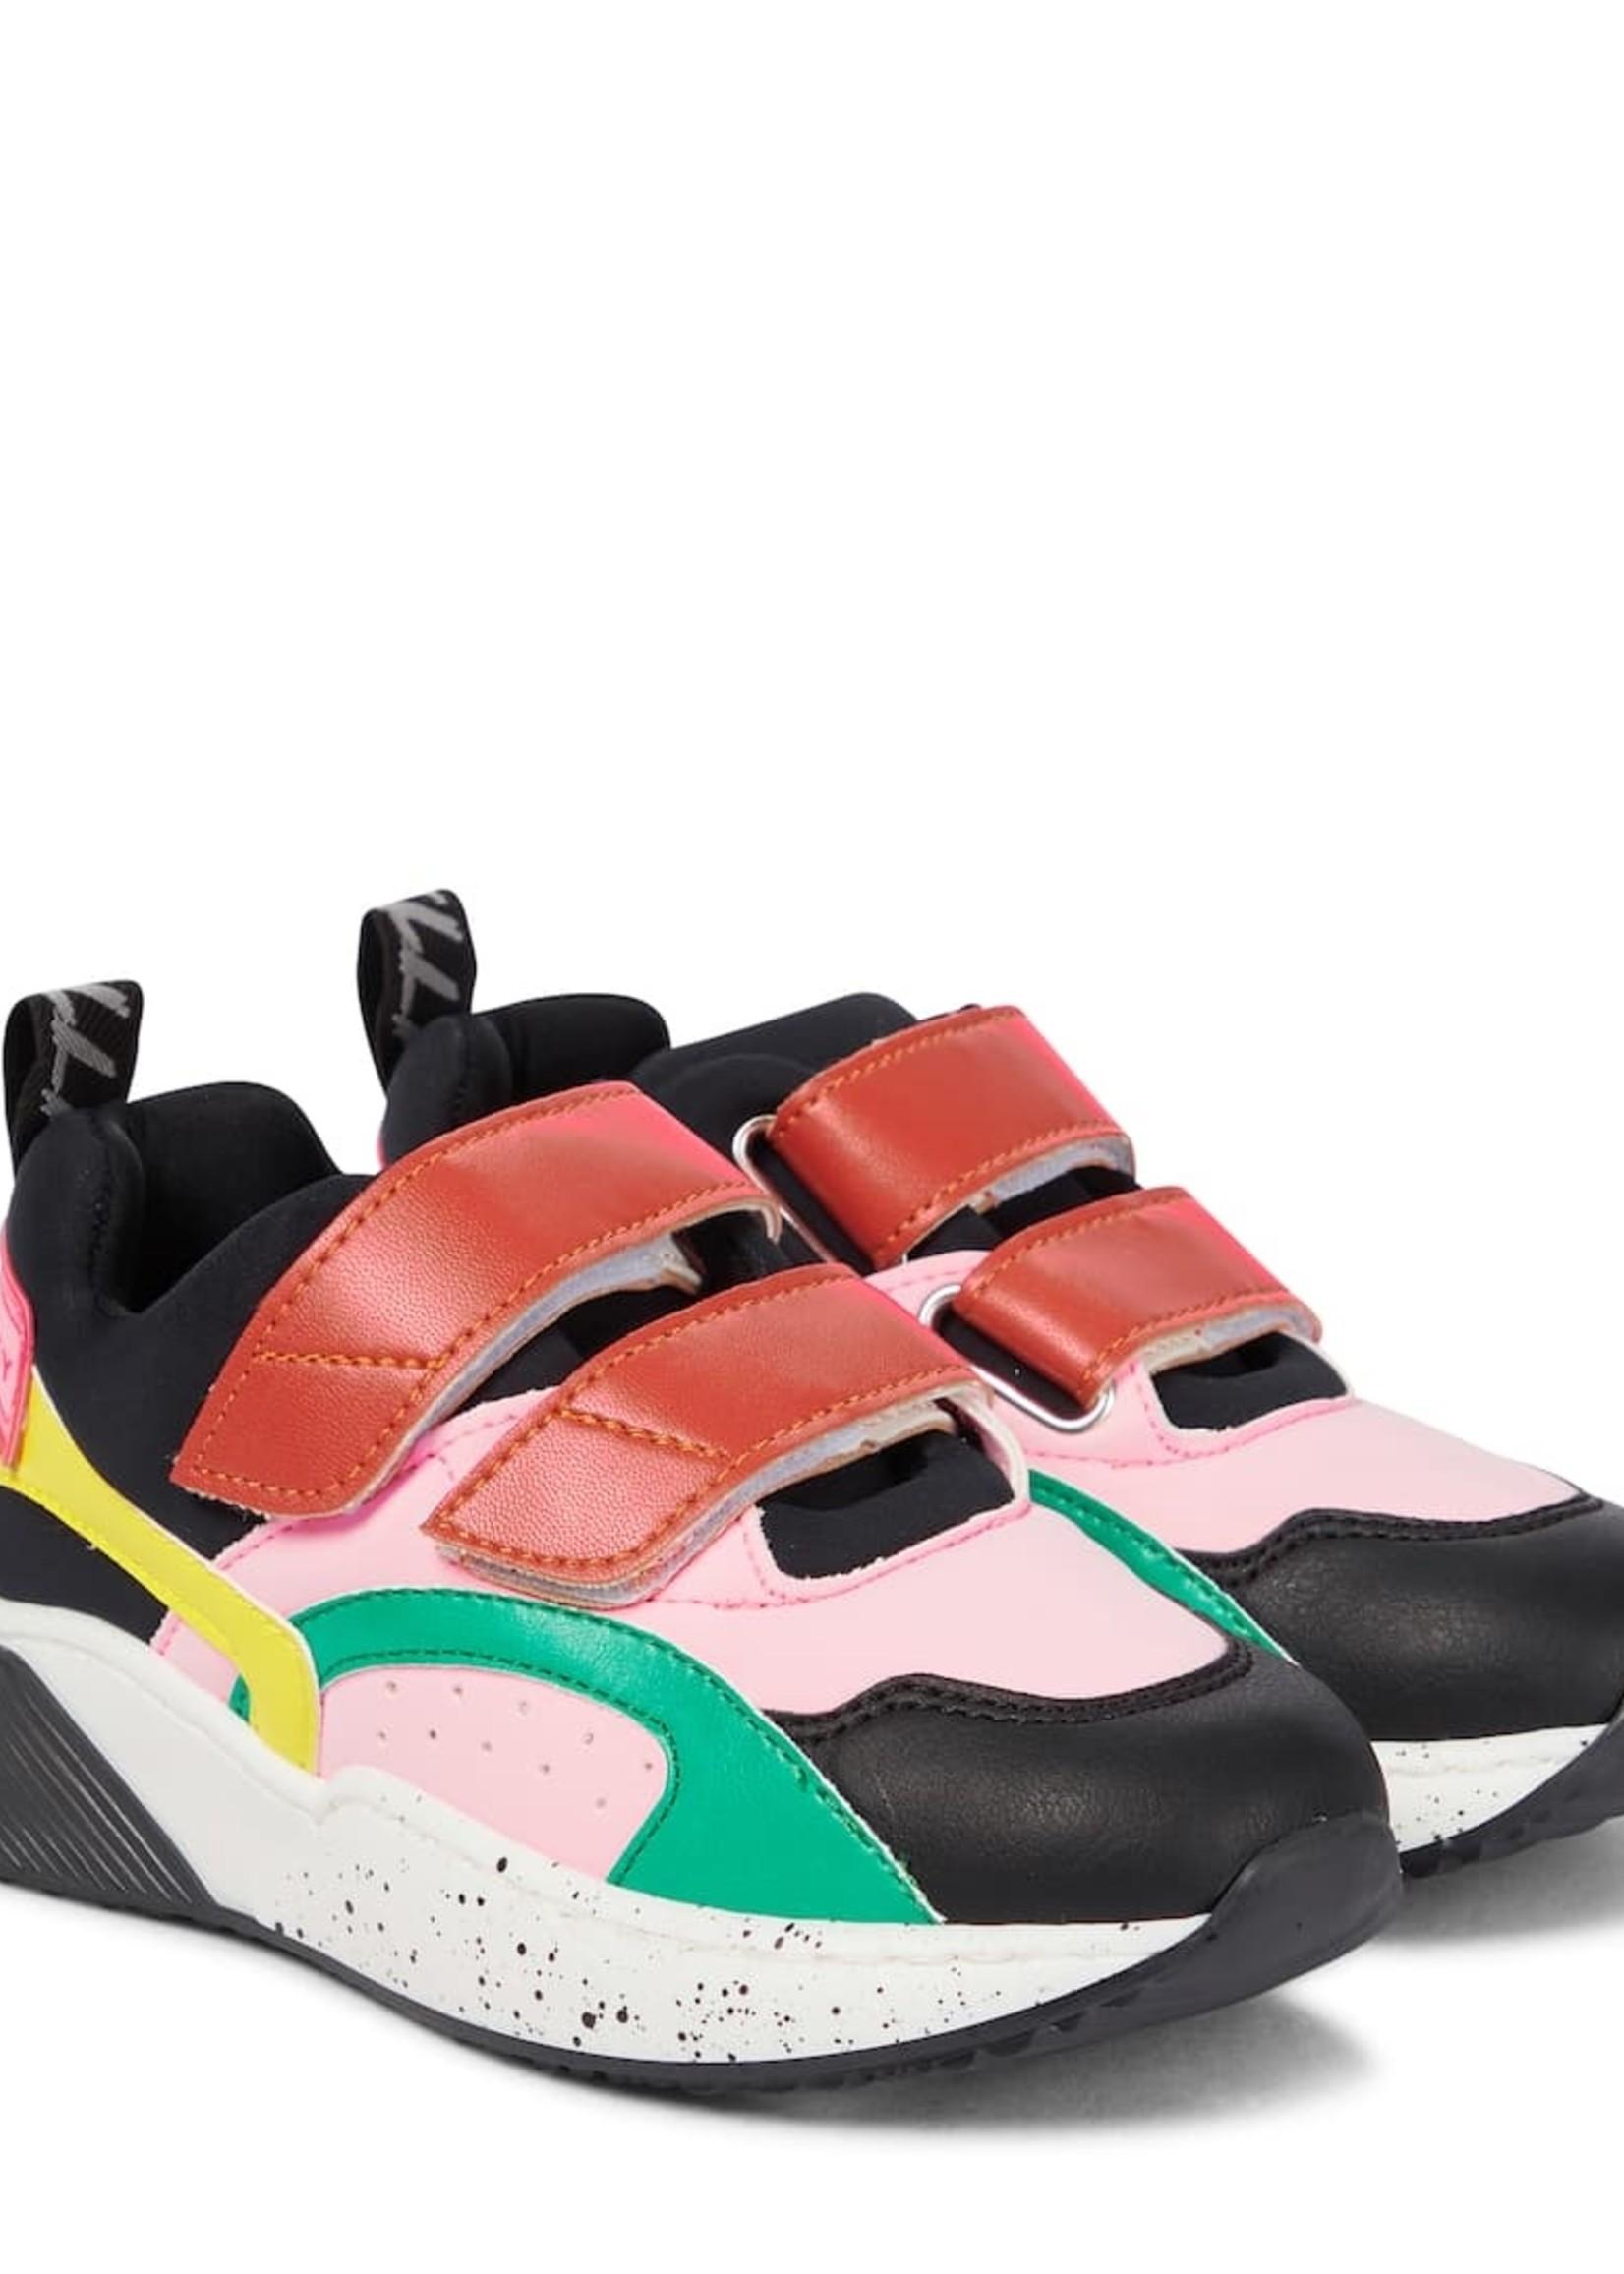 Stella McCartney Stella Mccartney-AW21 603391 pink Spots Trainers